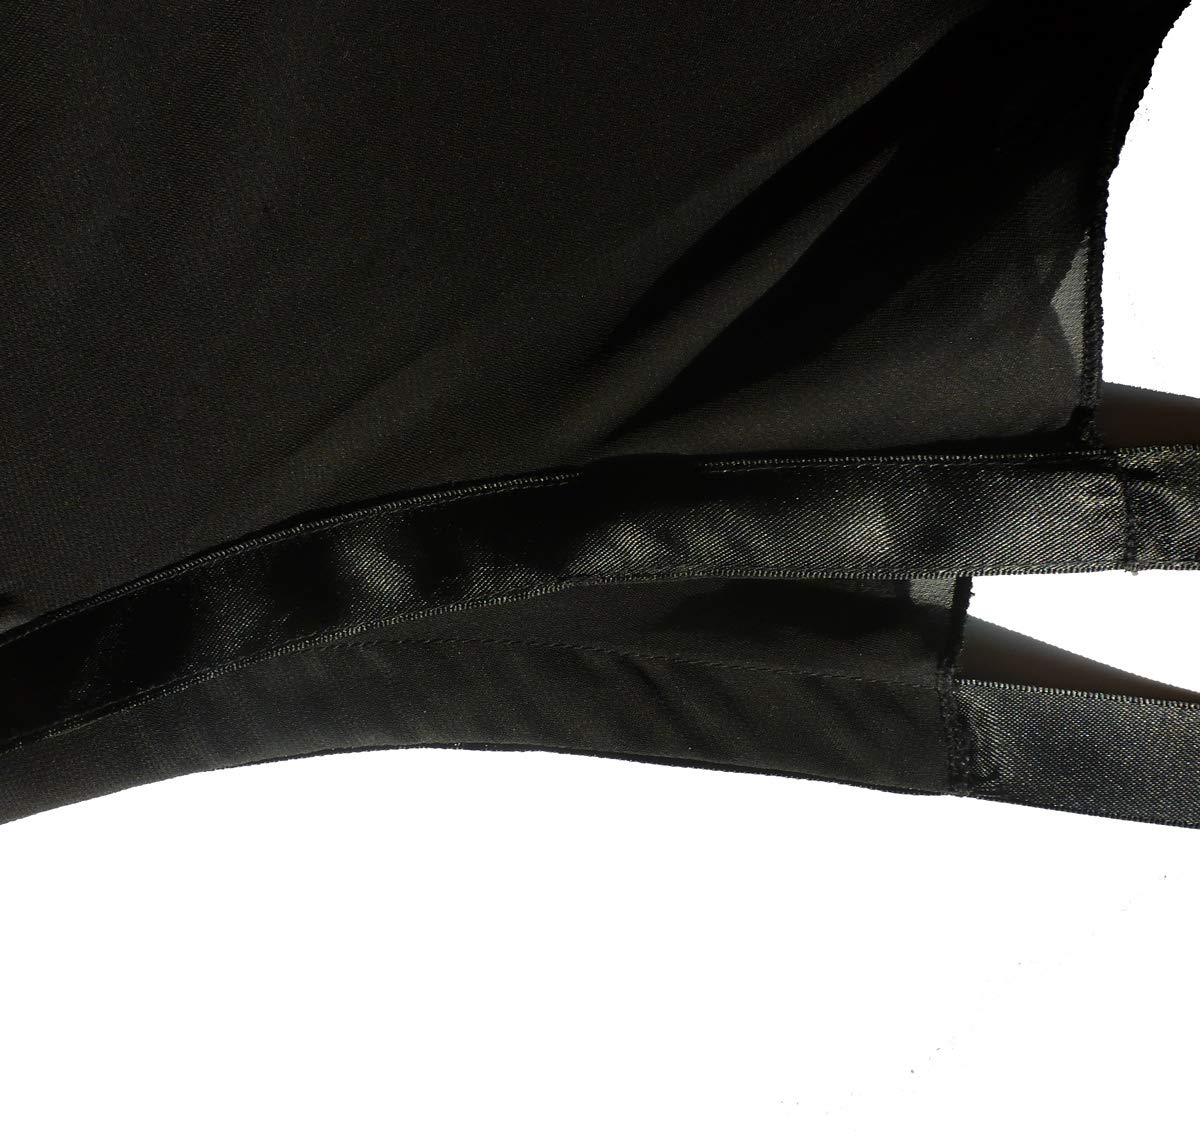 Ballet Dance Skirts for Women Chiffon Wrap Skirt Tutu for Girls-Big Size (M) Black